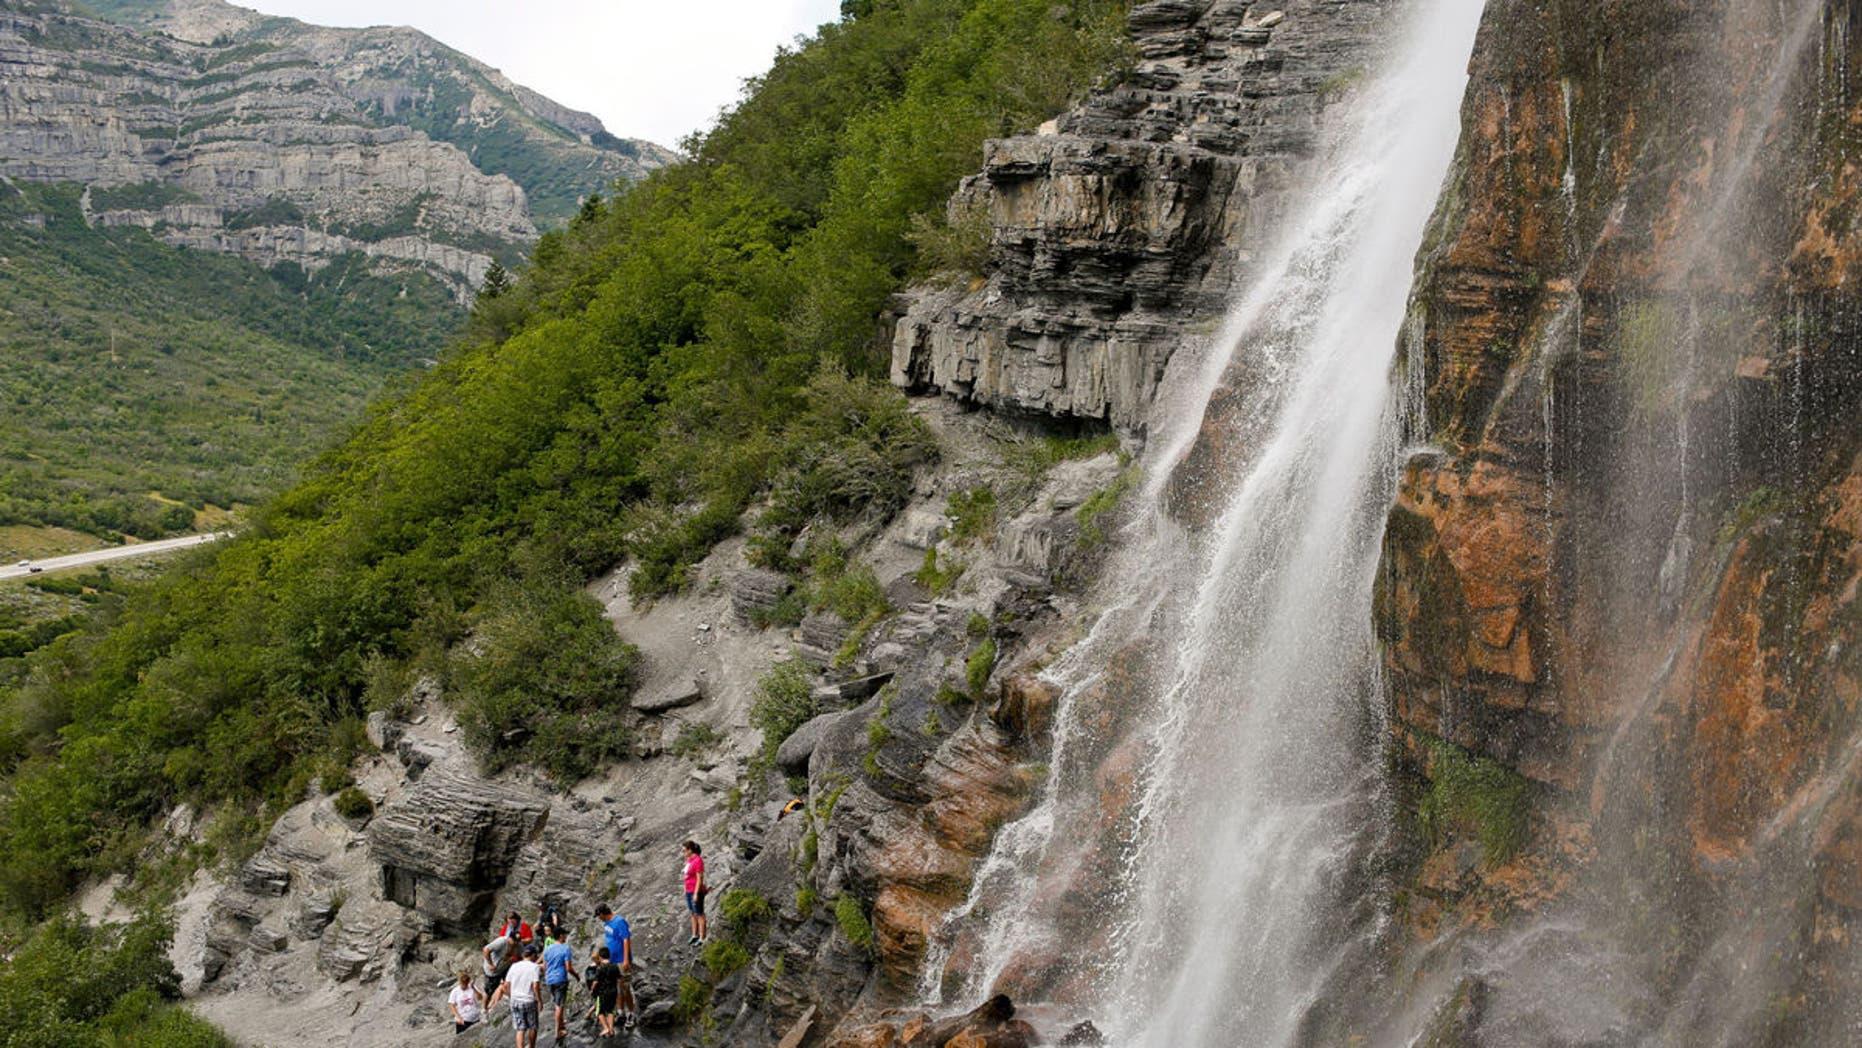 Bridal Veil Falls in Provo Canyon.